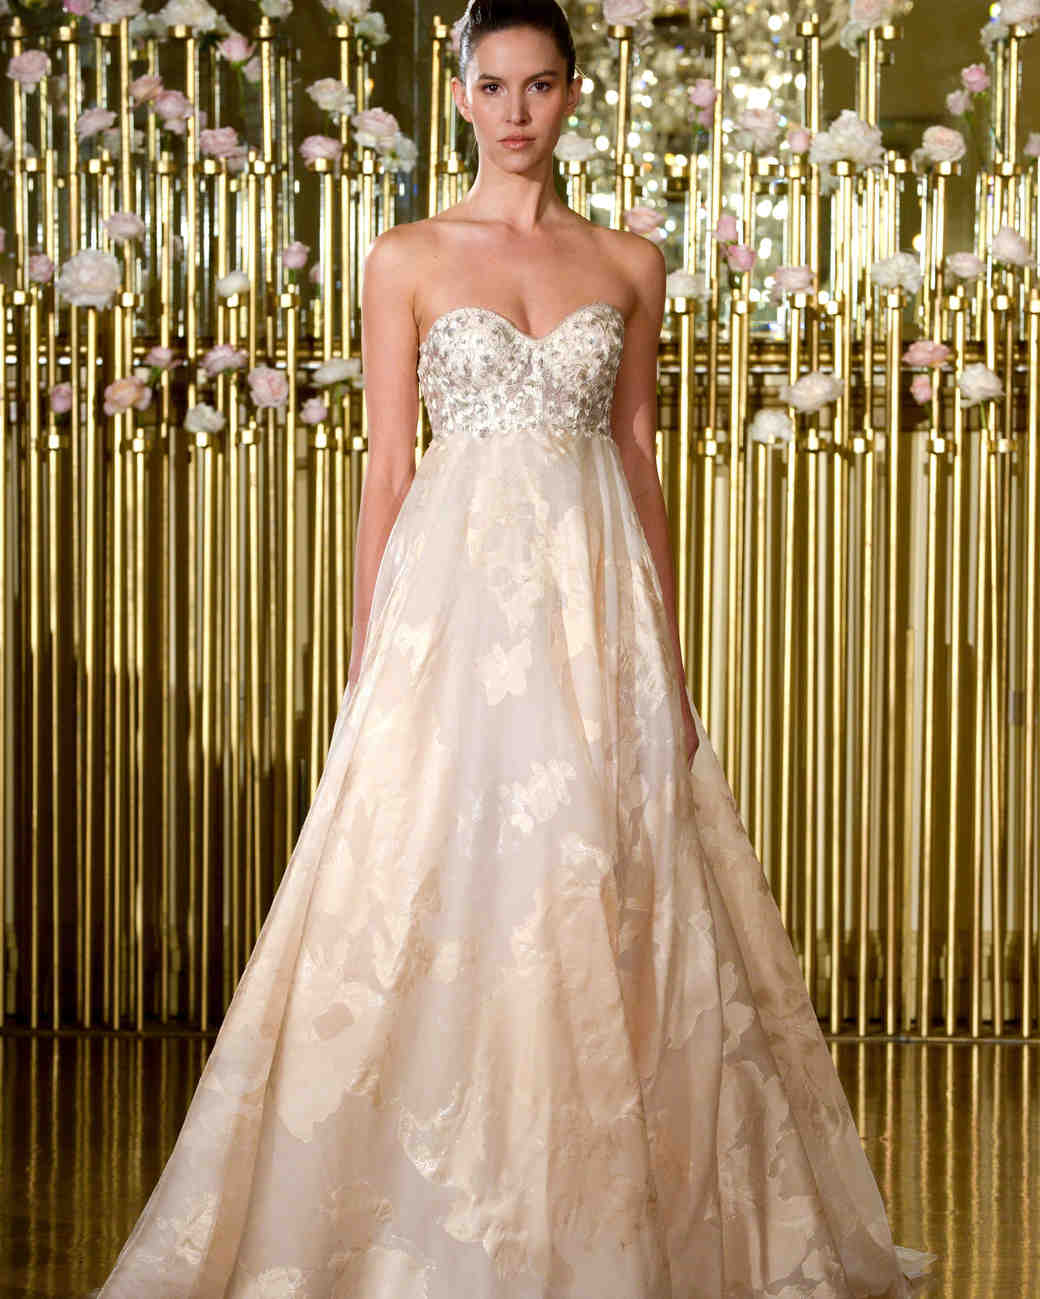 Francesca Miranda A-Line Wedding Dress with Sweetheart Neckline Spring 2018